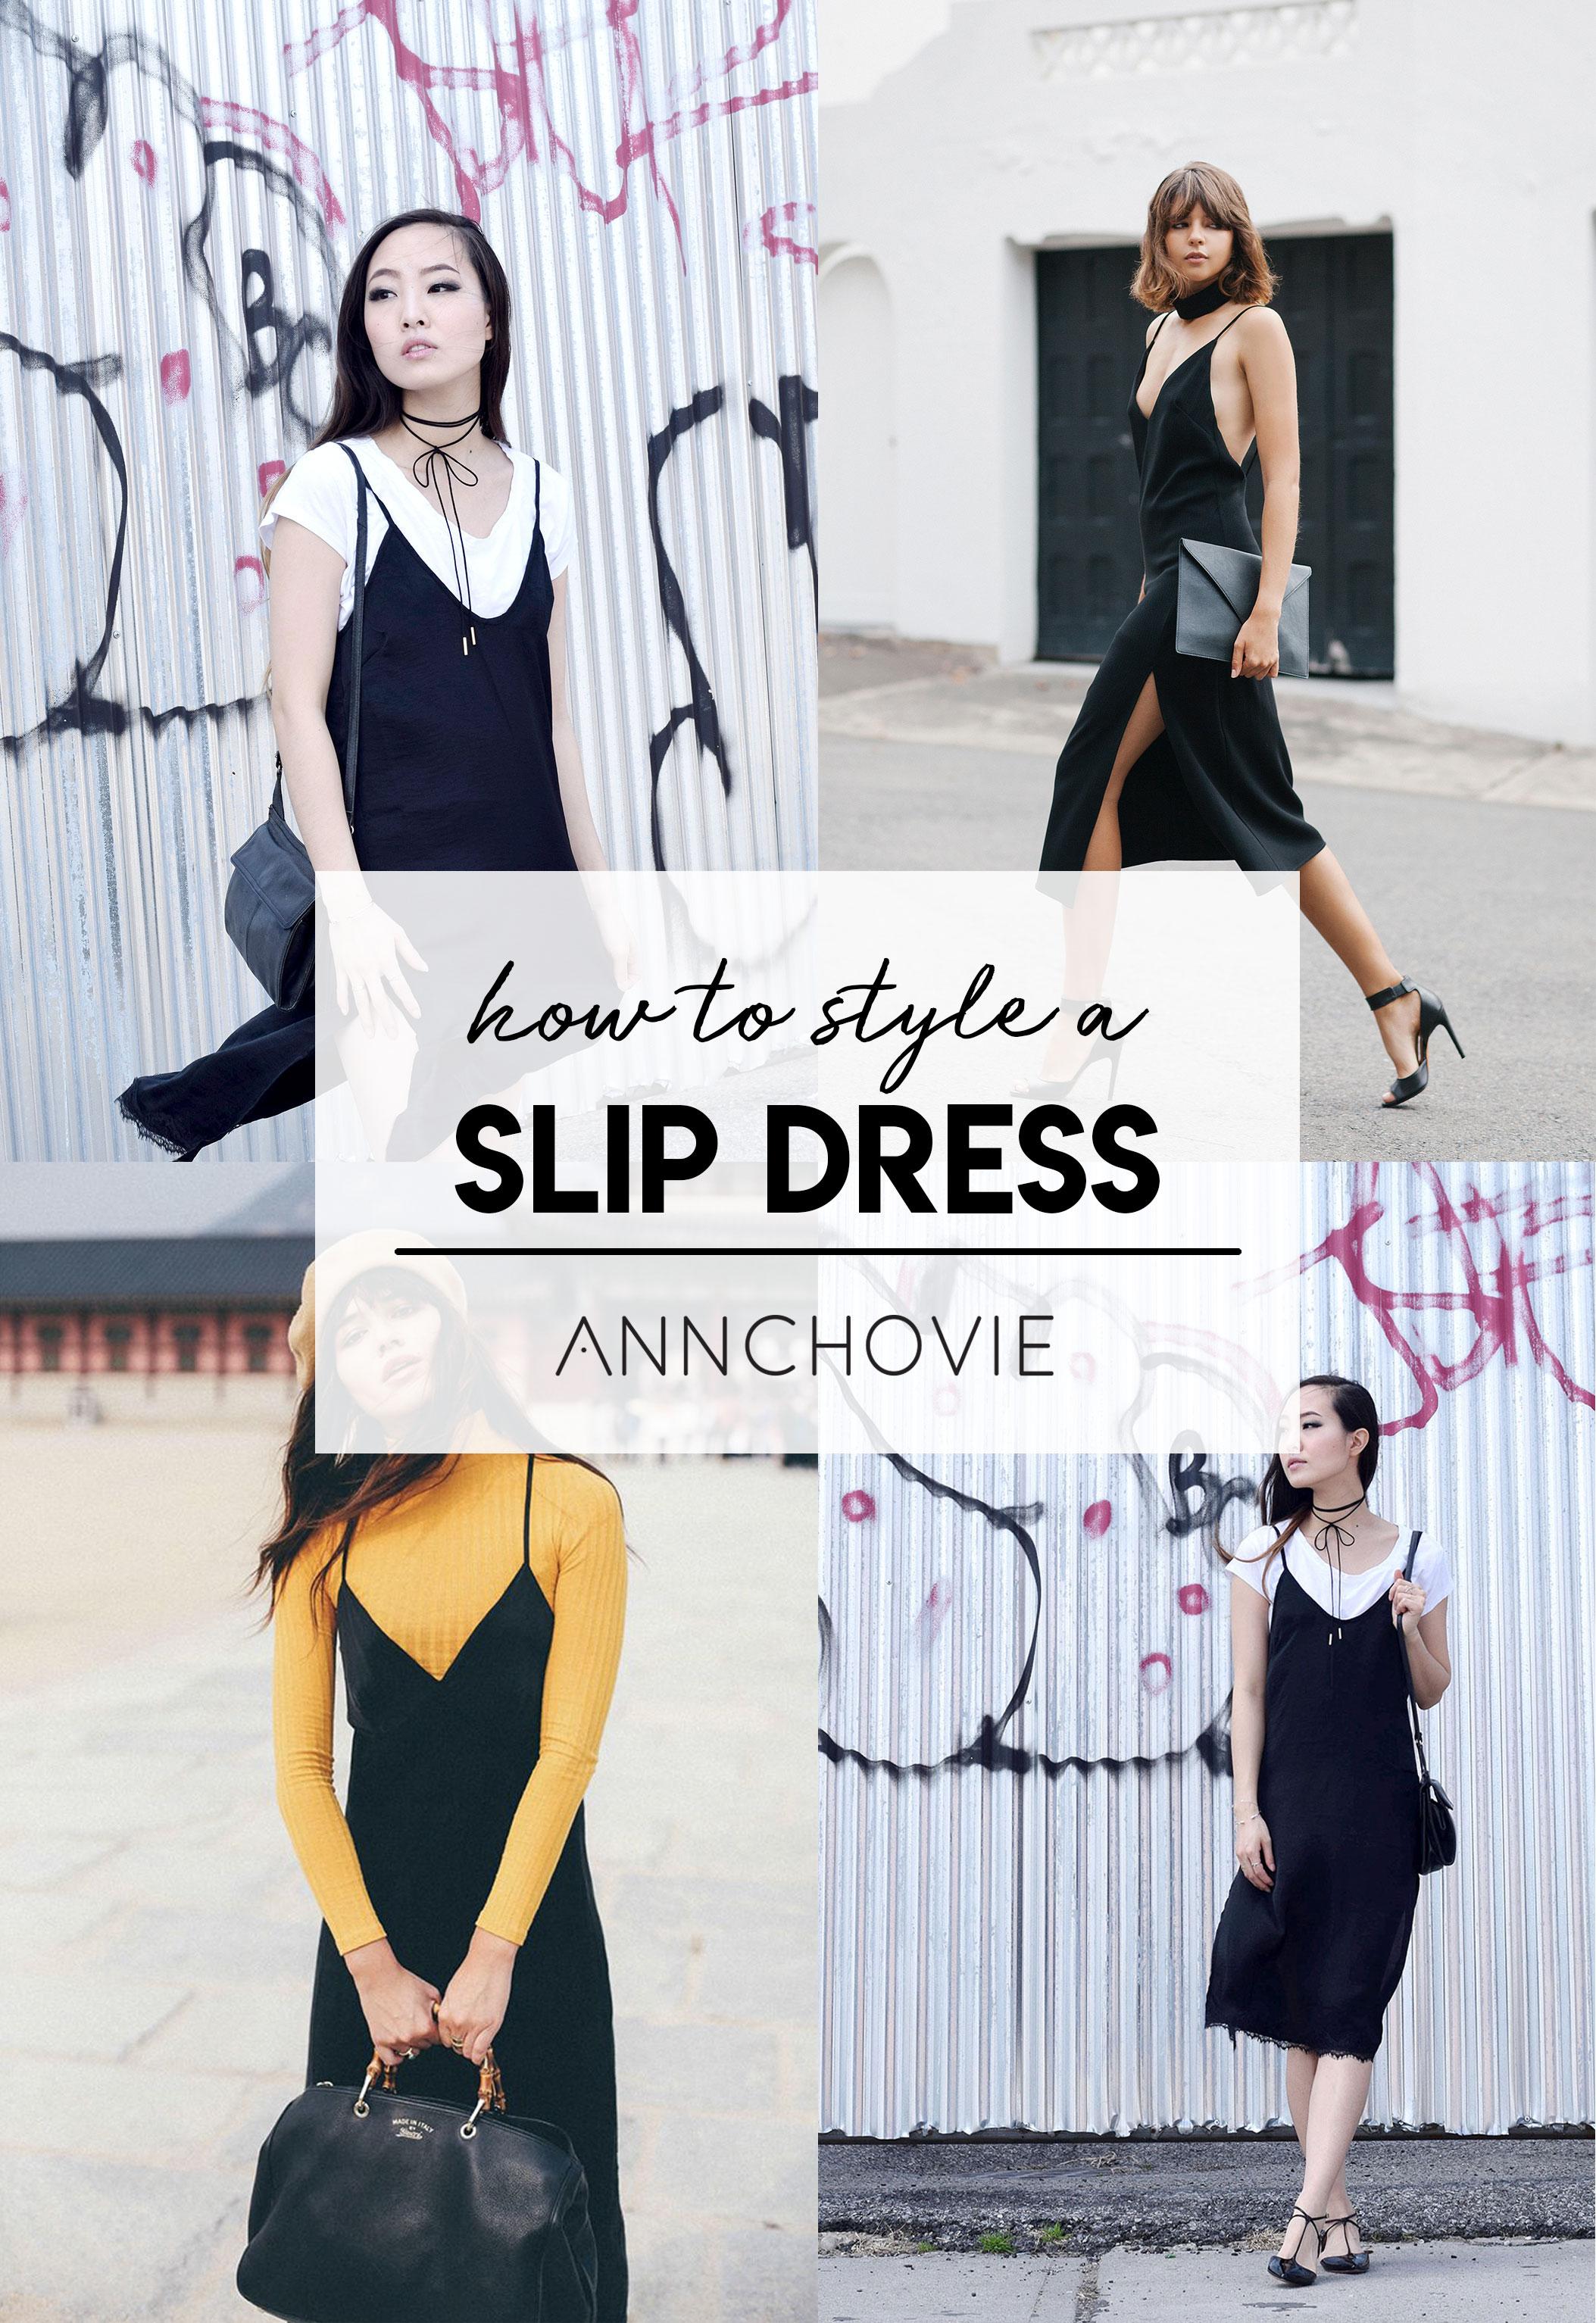 how-to-style-a-slip-dress-pinterest-O.jpg